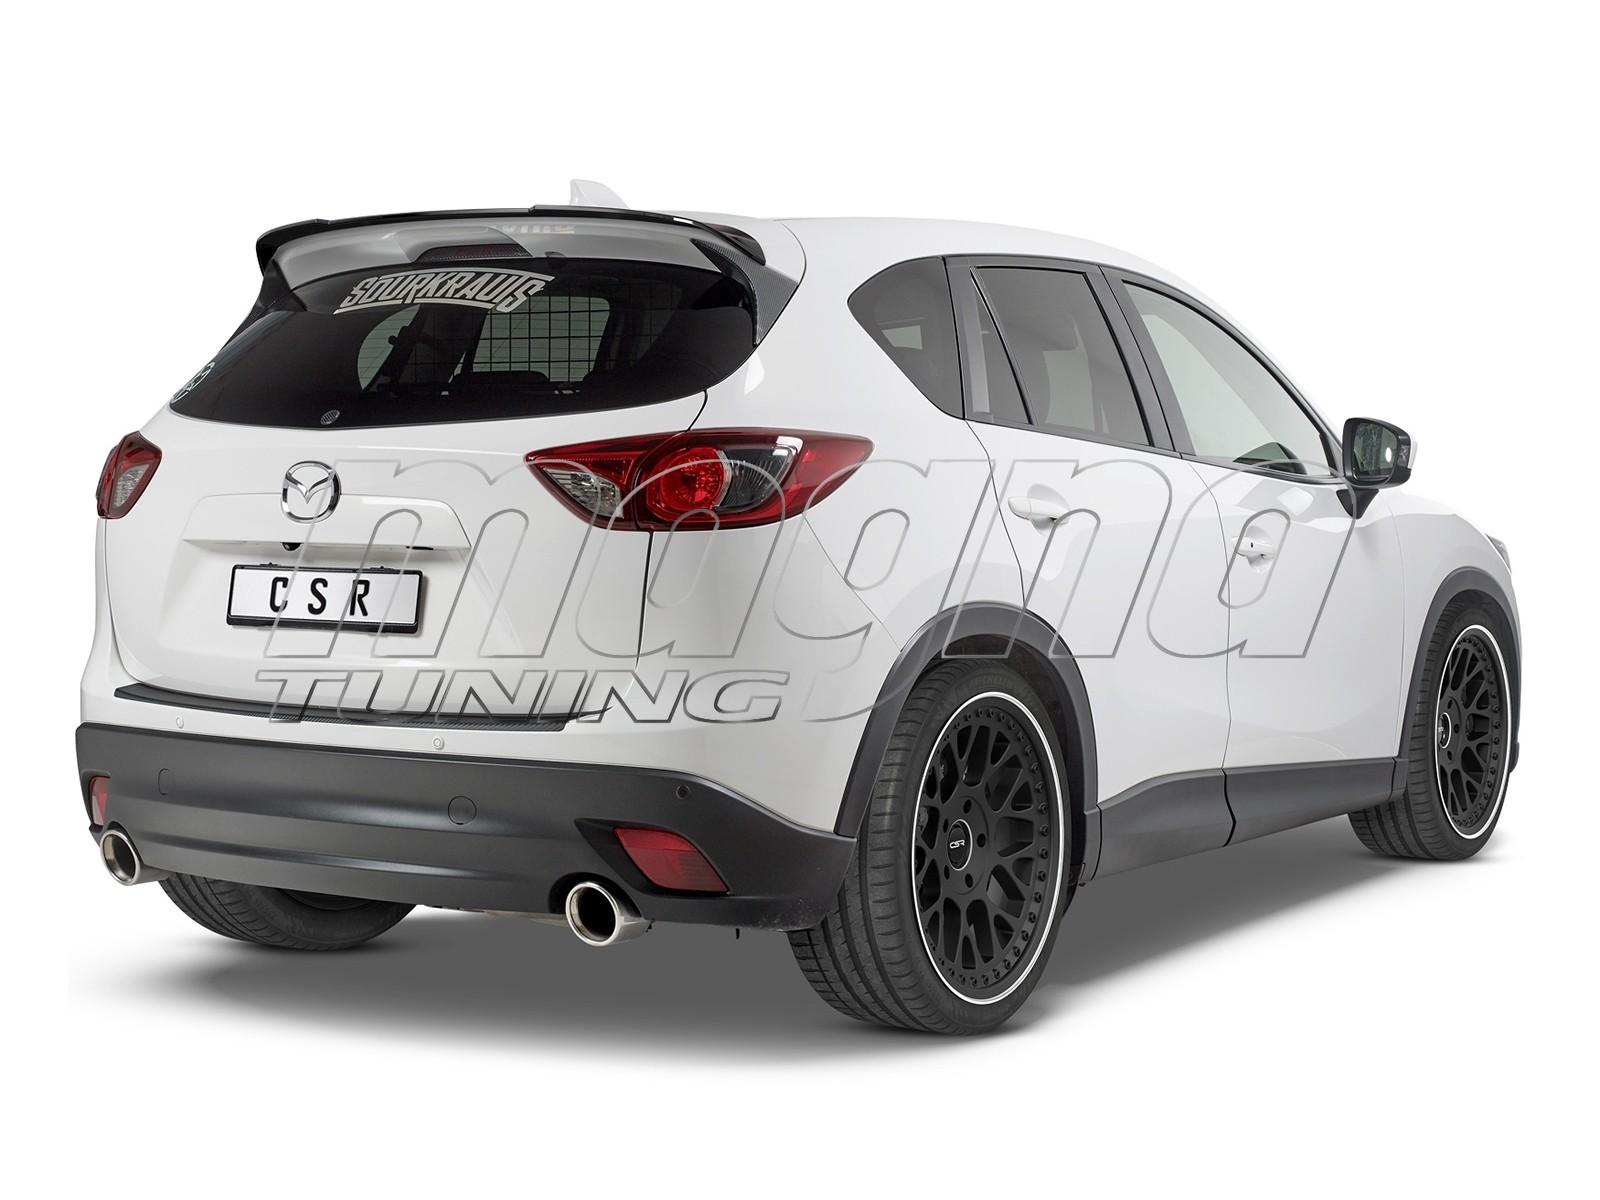 Mazda CX-5 KE Citrix Rear Wing Extension